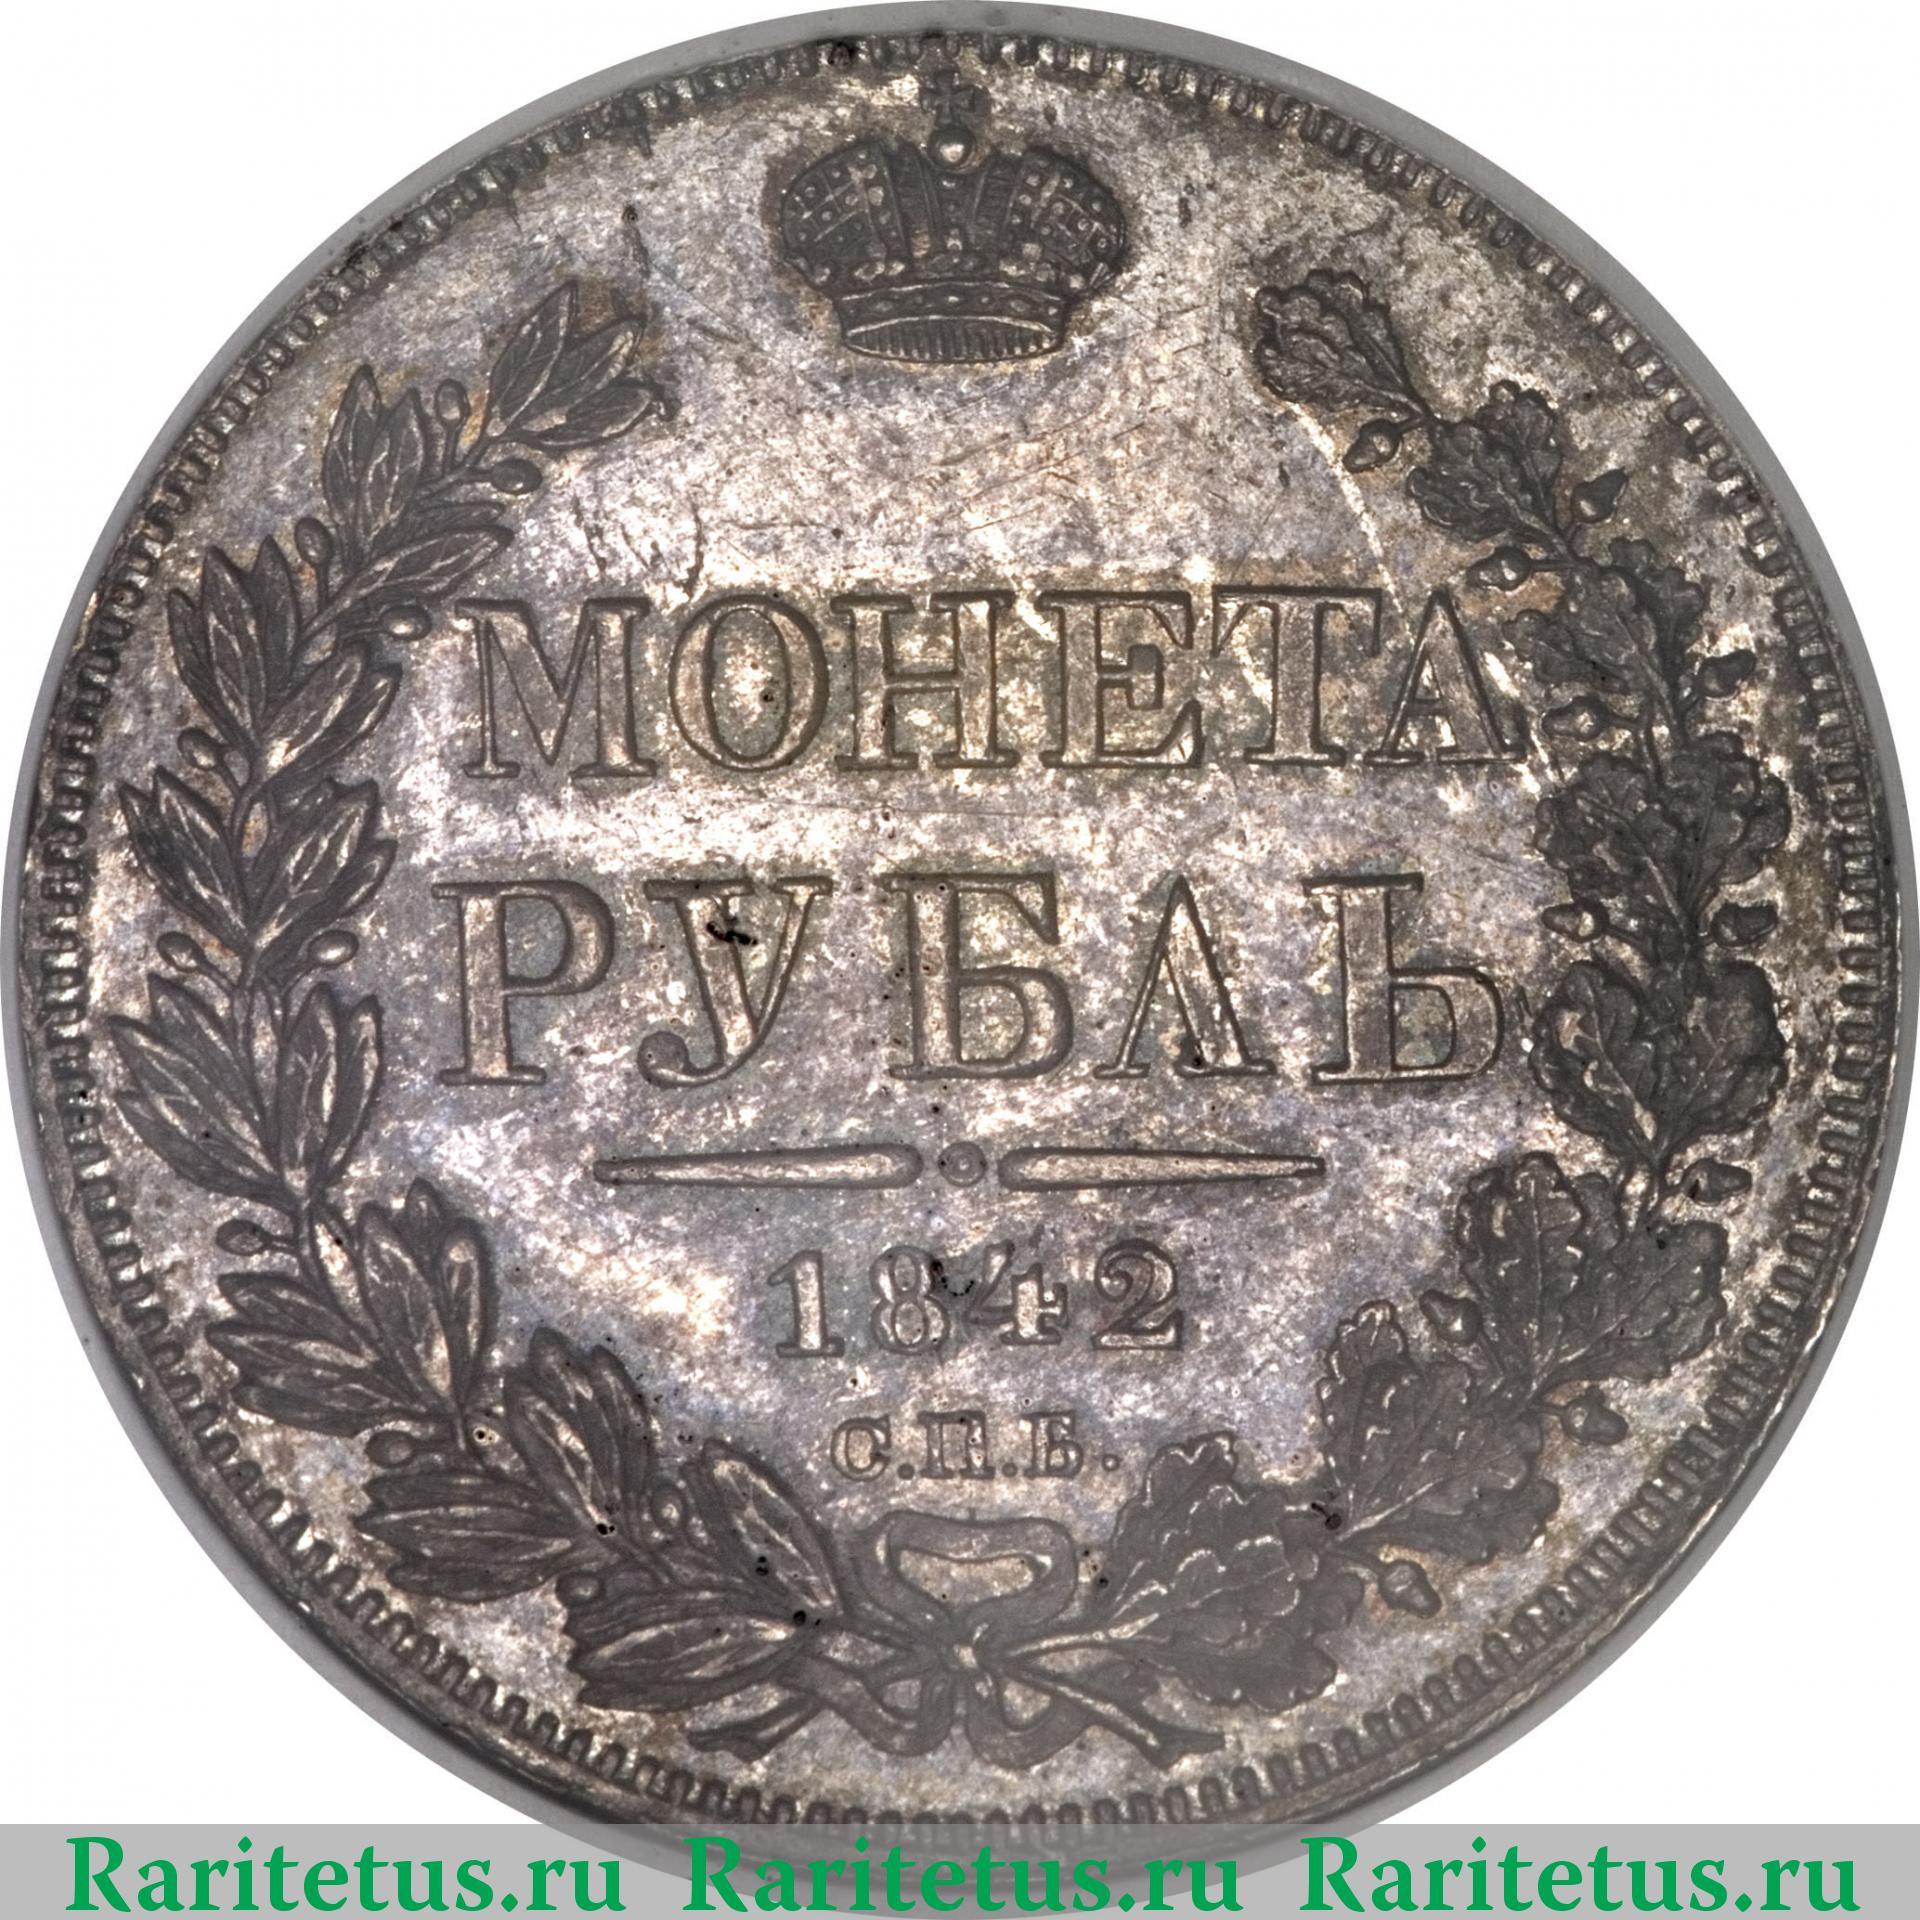 2 копейки 1838 цена